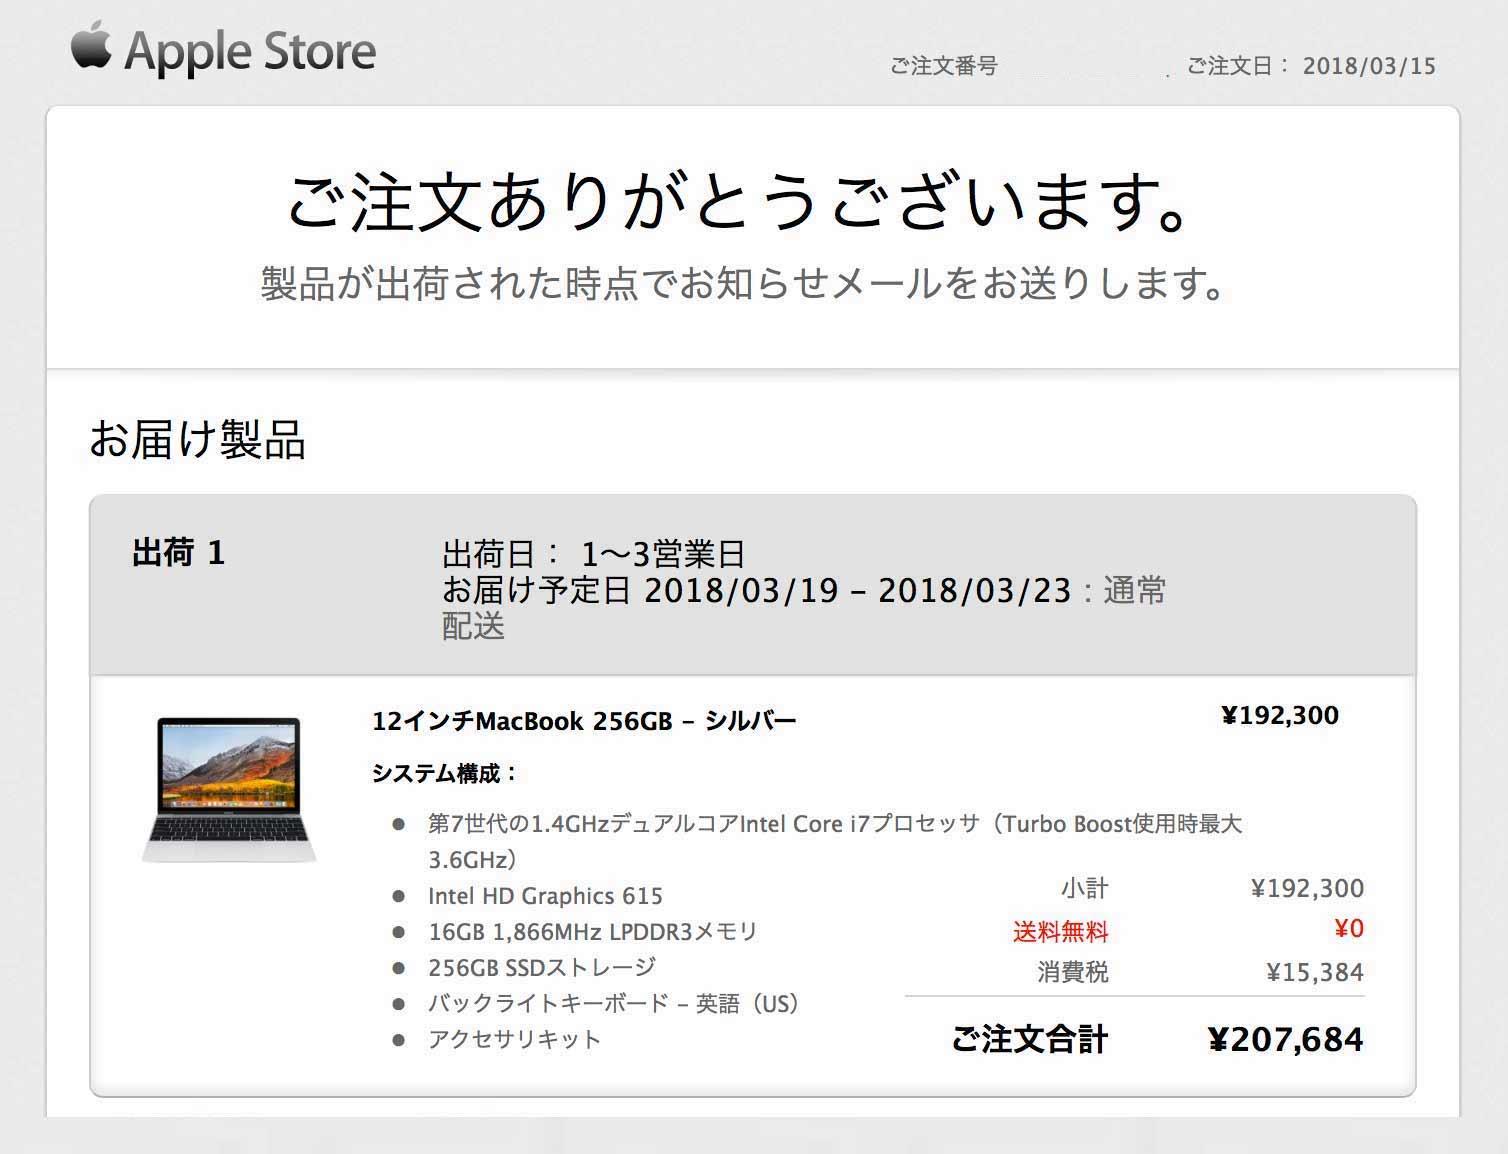 MacBook12インチCTO購入画面の画像